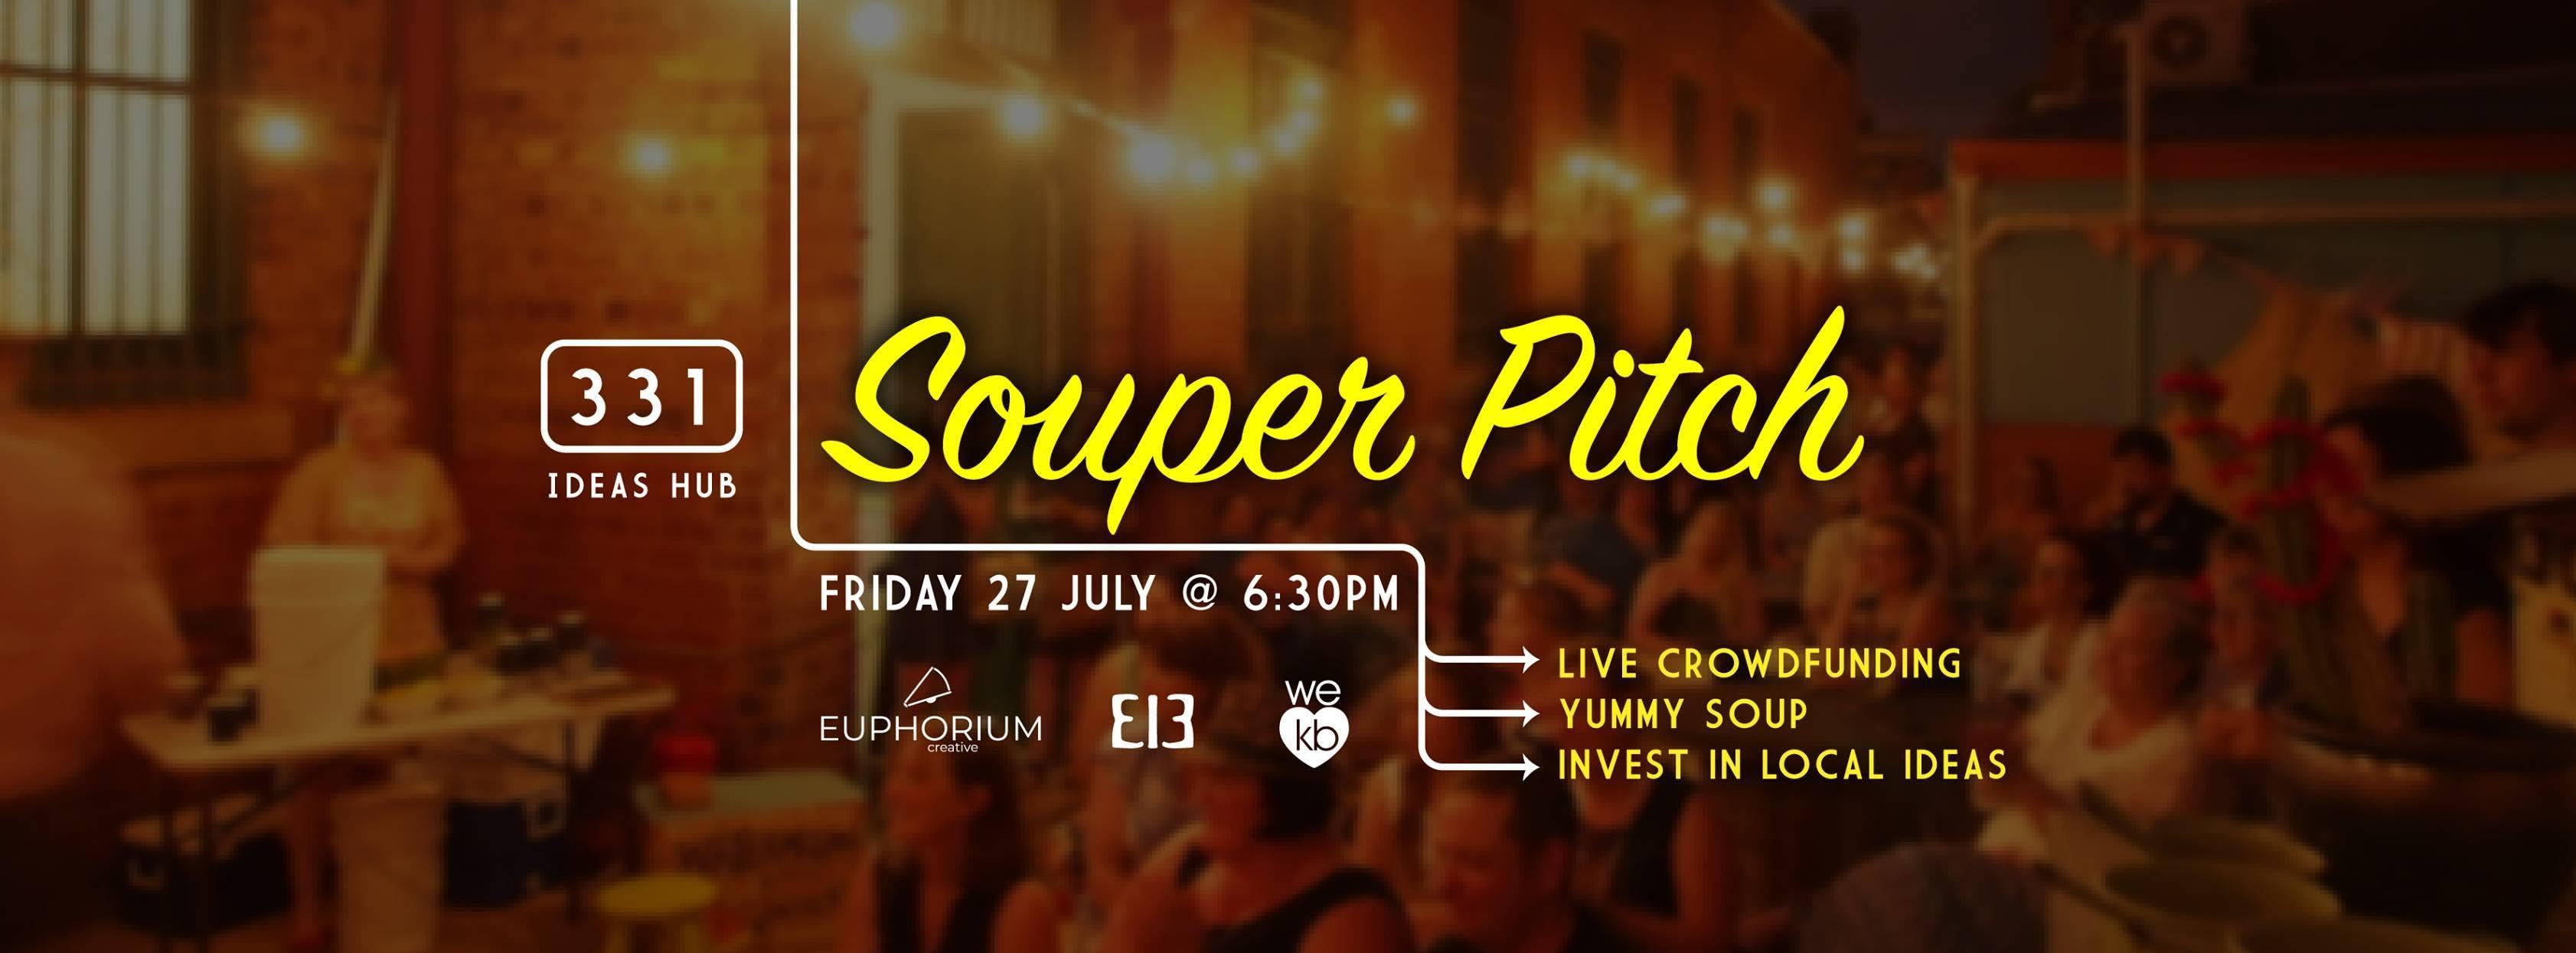 Souper Pitch - Live Crowdfunding